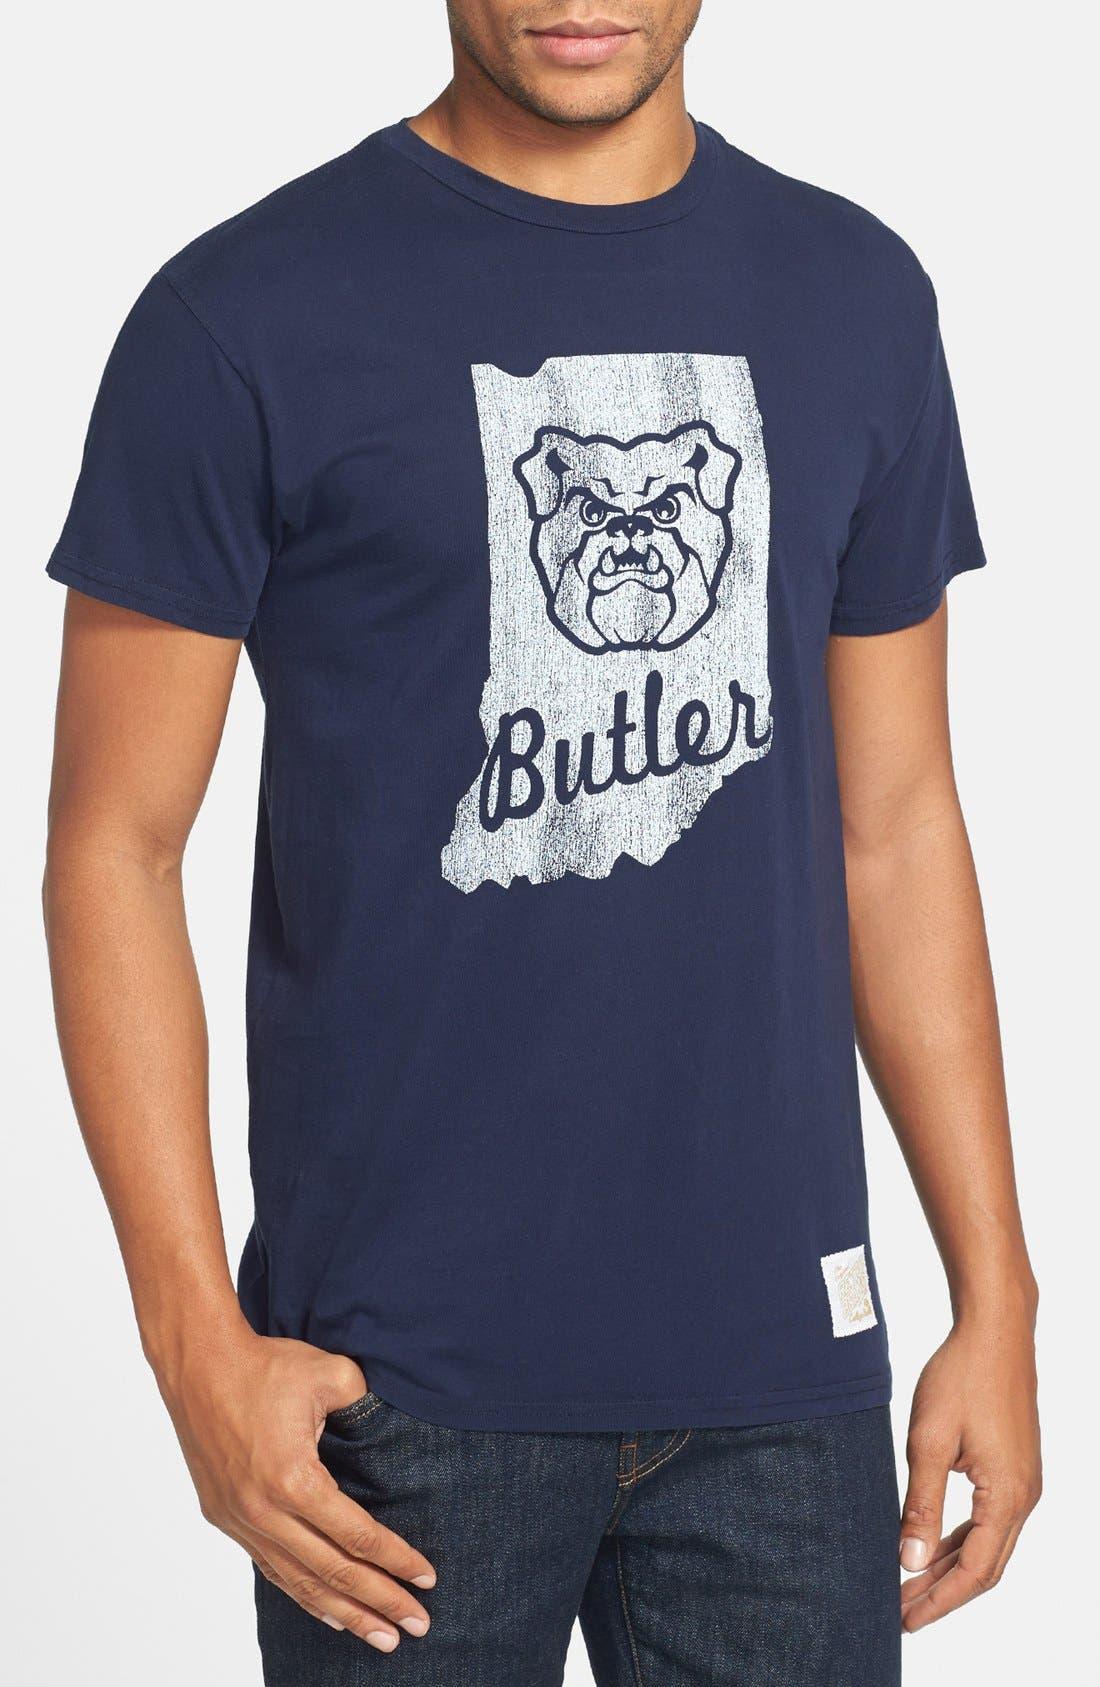 Main Image - Retro Brand 'Butler Bulldogs' Team T-Shirt